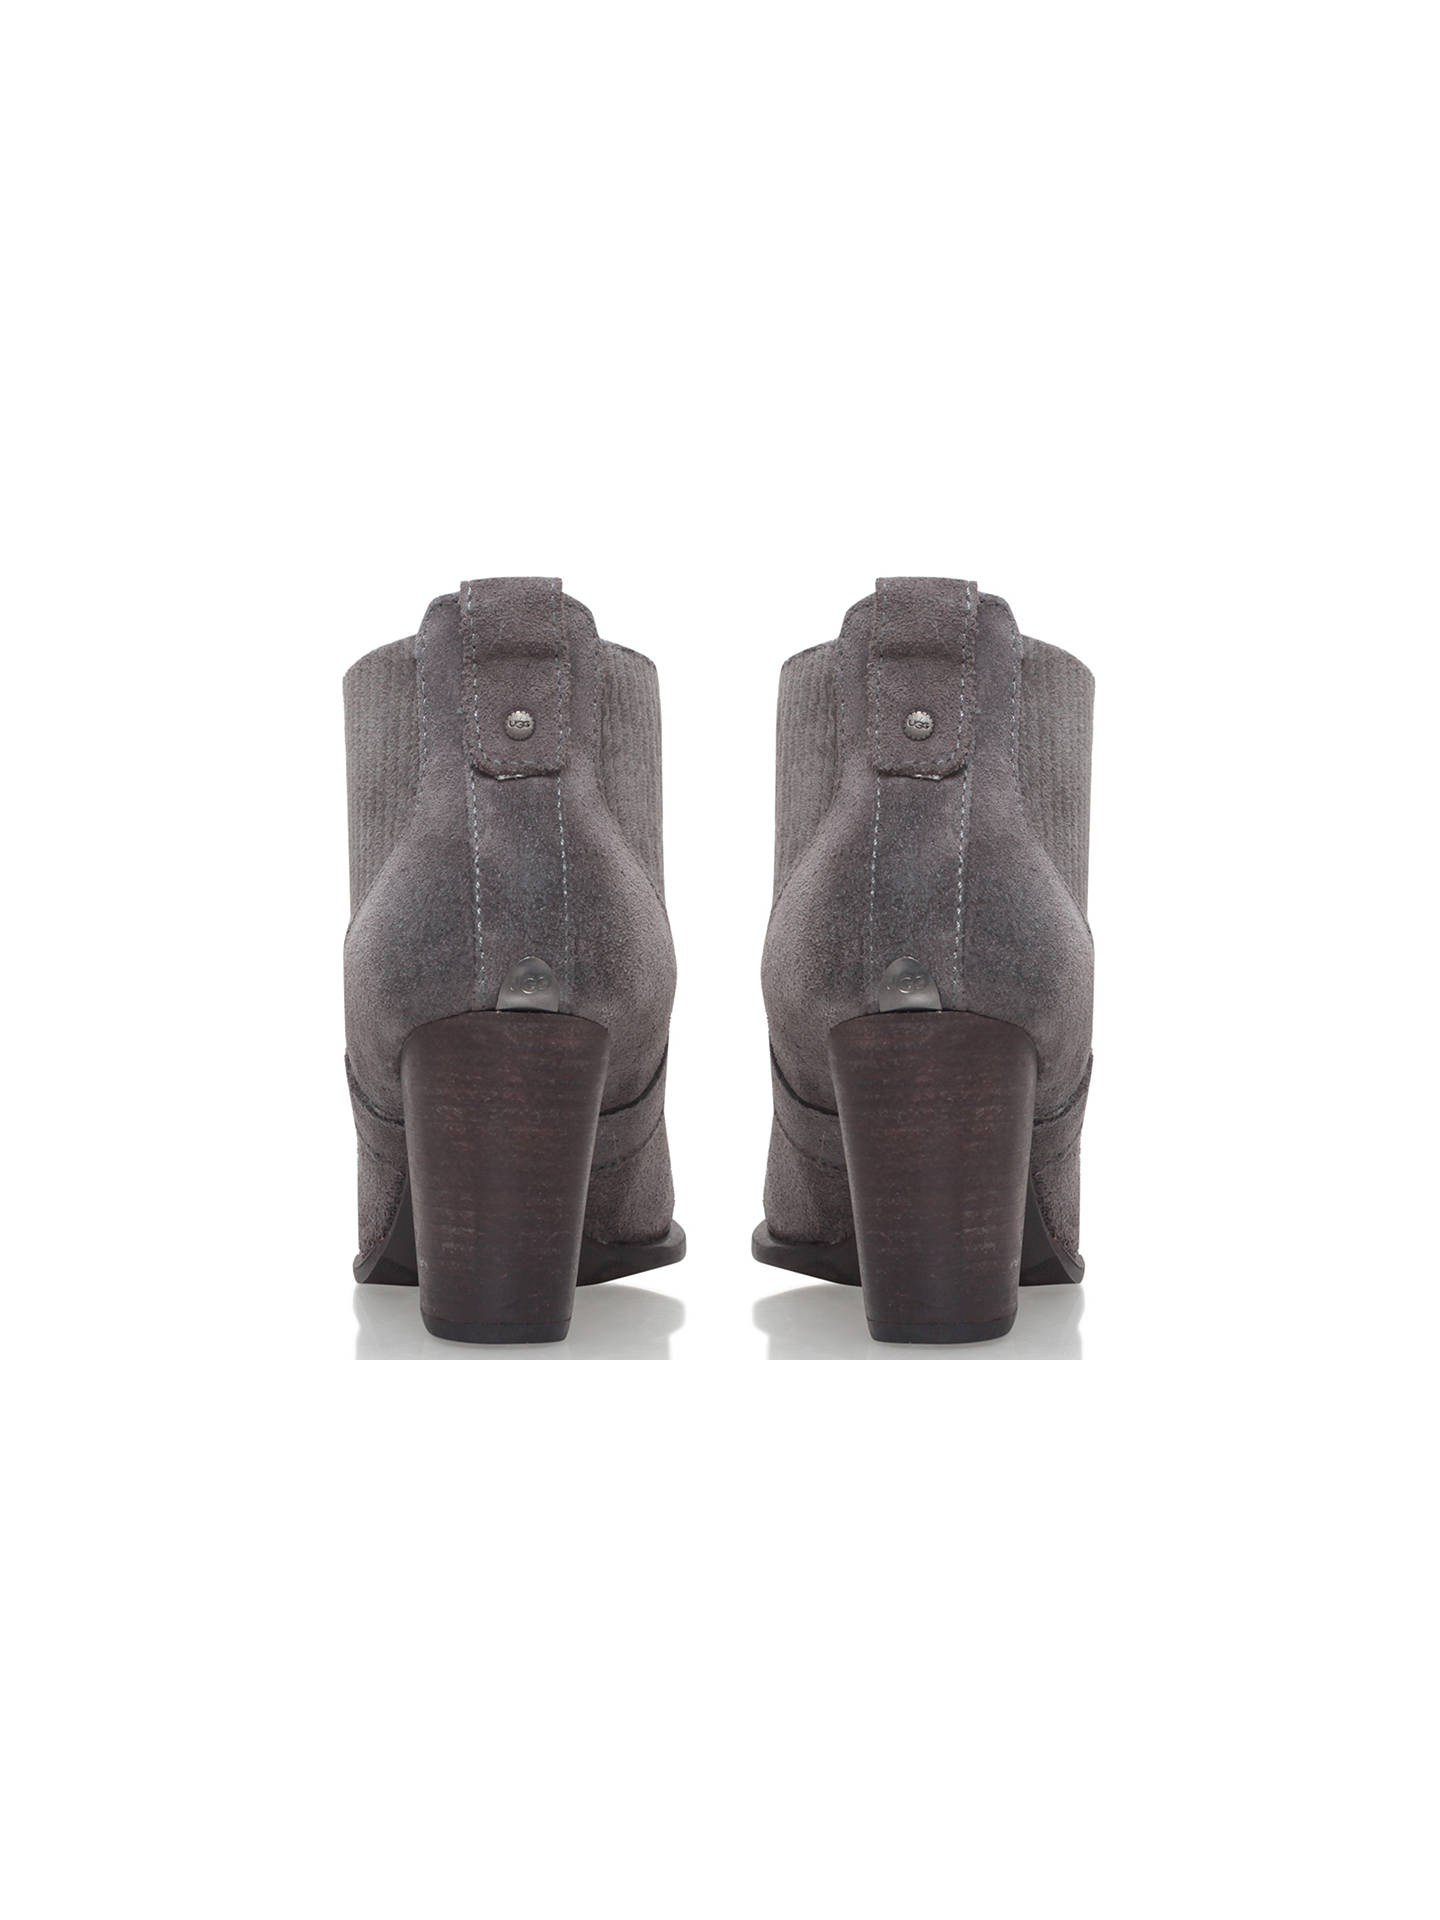 fd501fc84b8 UGG Cobie II Block Heel Ankle Boots, Grey Suede at John Lewis & Partners